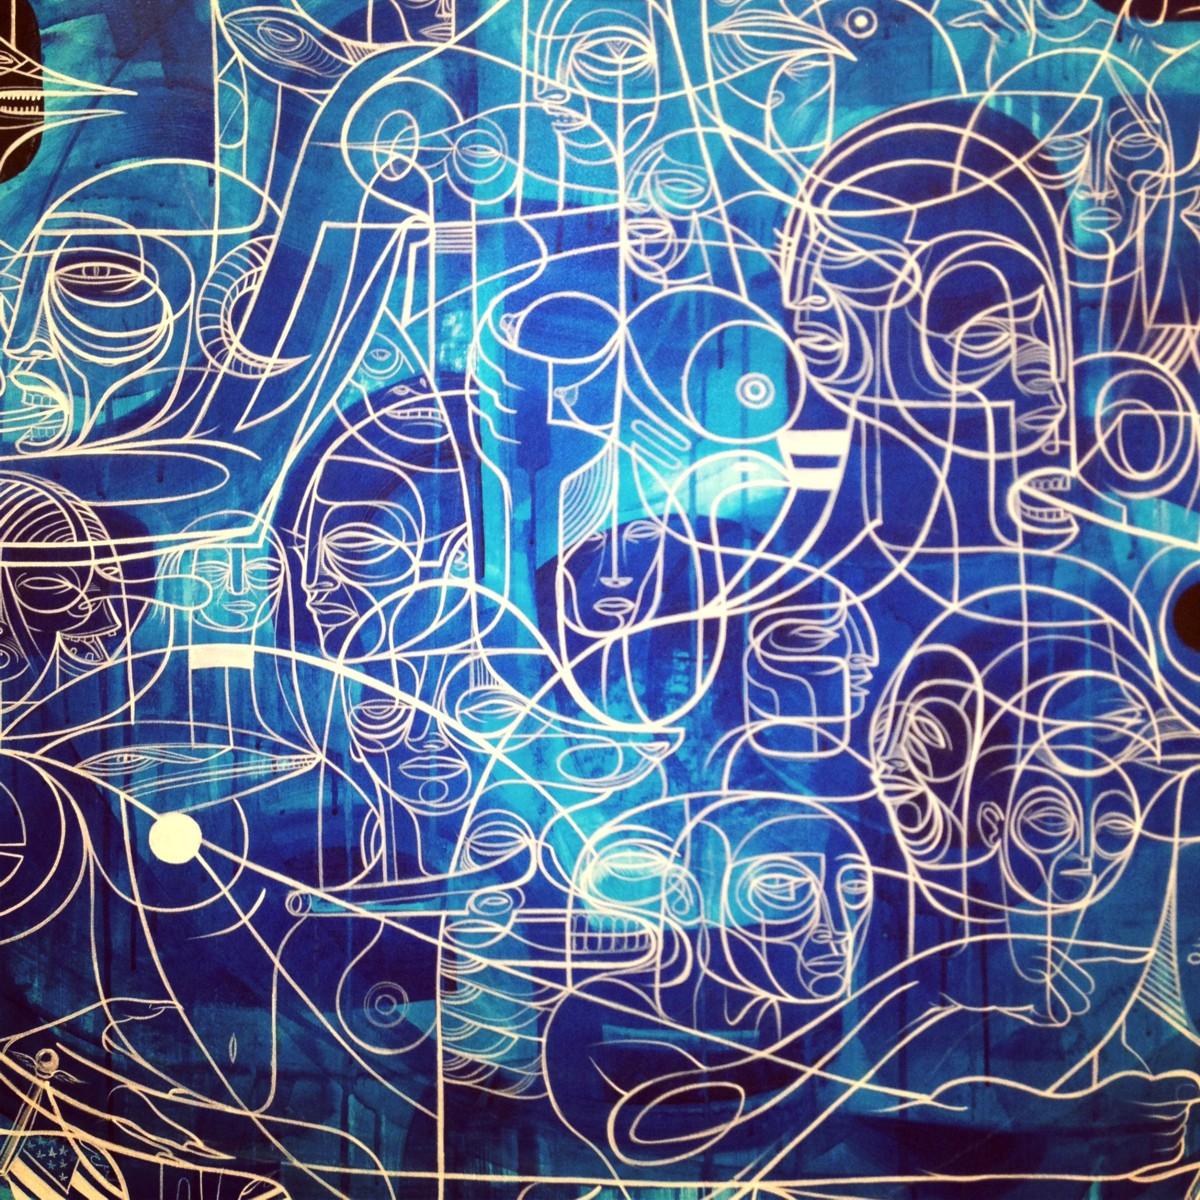 Lilith s progeny by doze green painting galerie openspace paris street art exhibition - Galerie street art paris ...